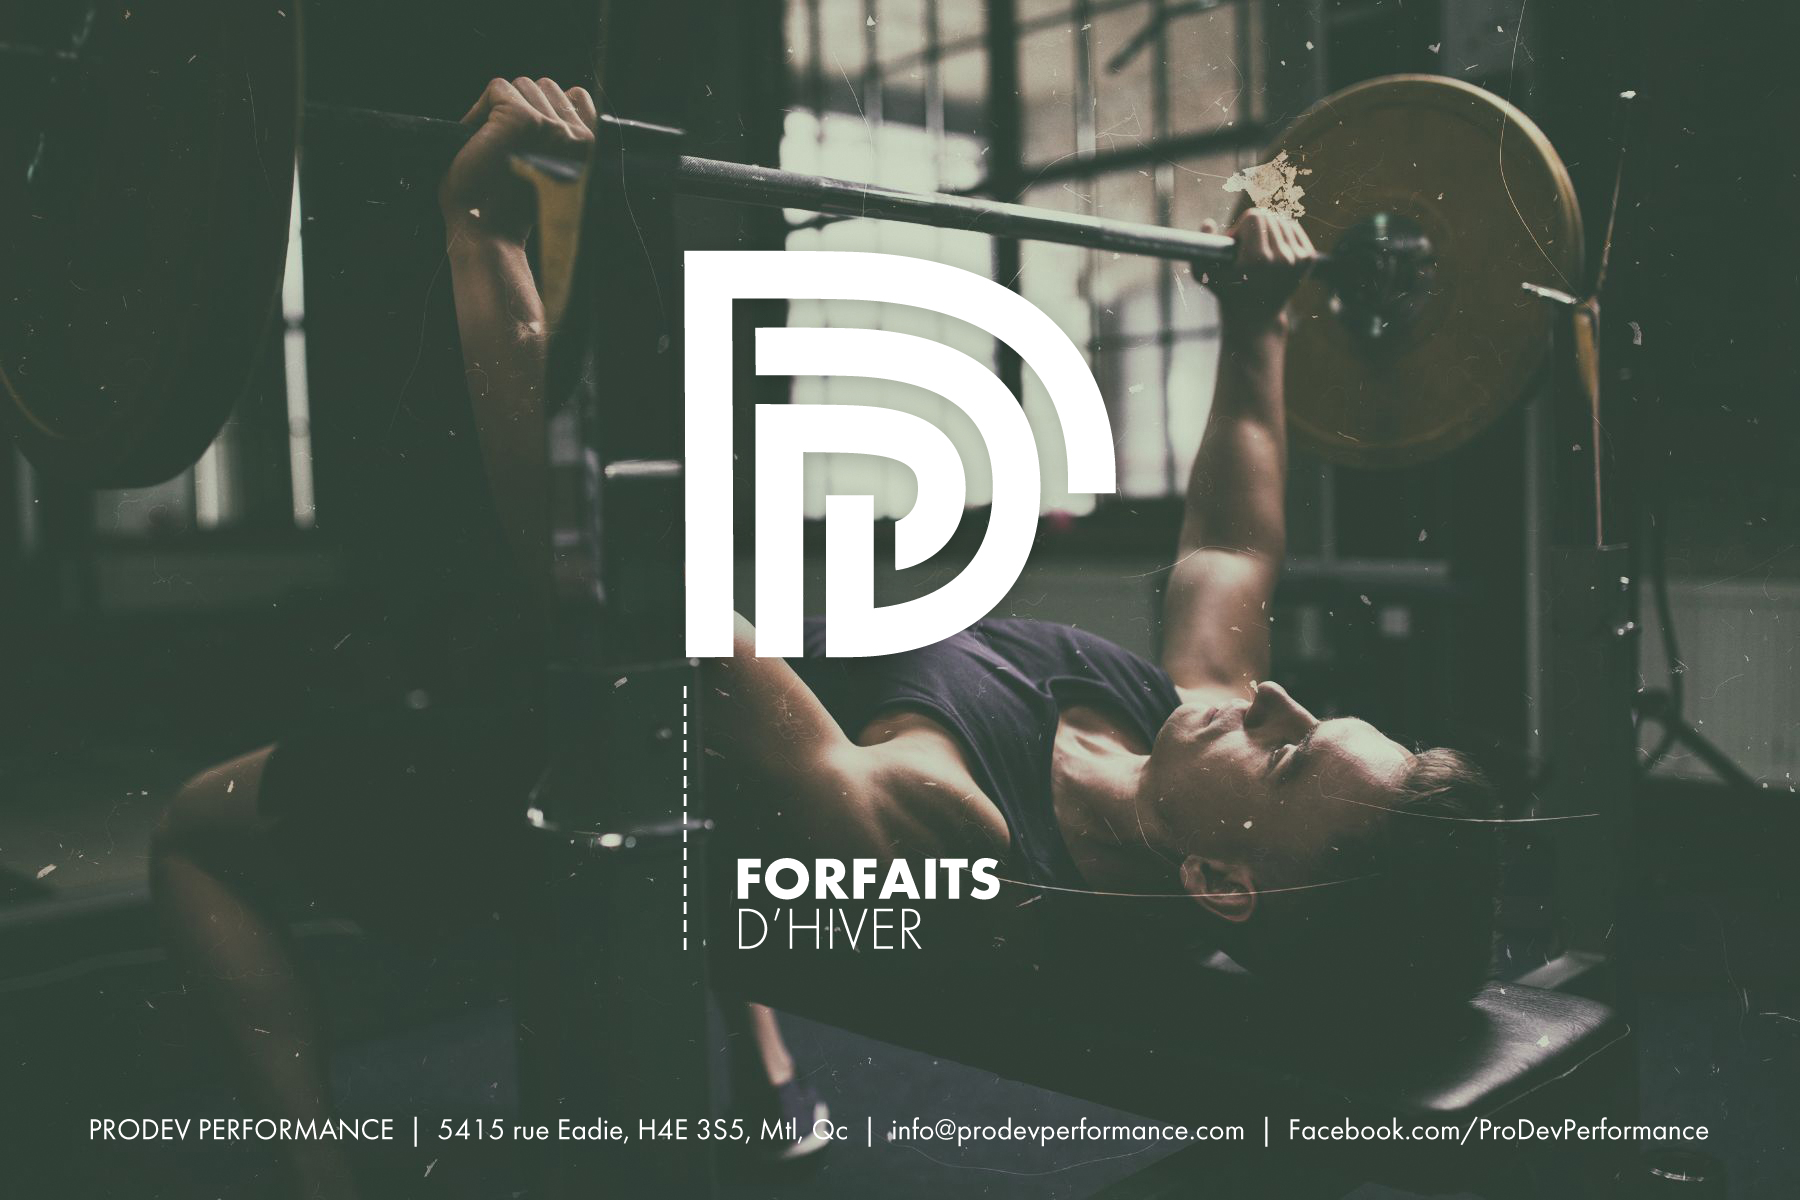 Forfaits Postcard-front-edit.jpg